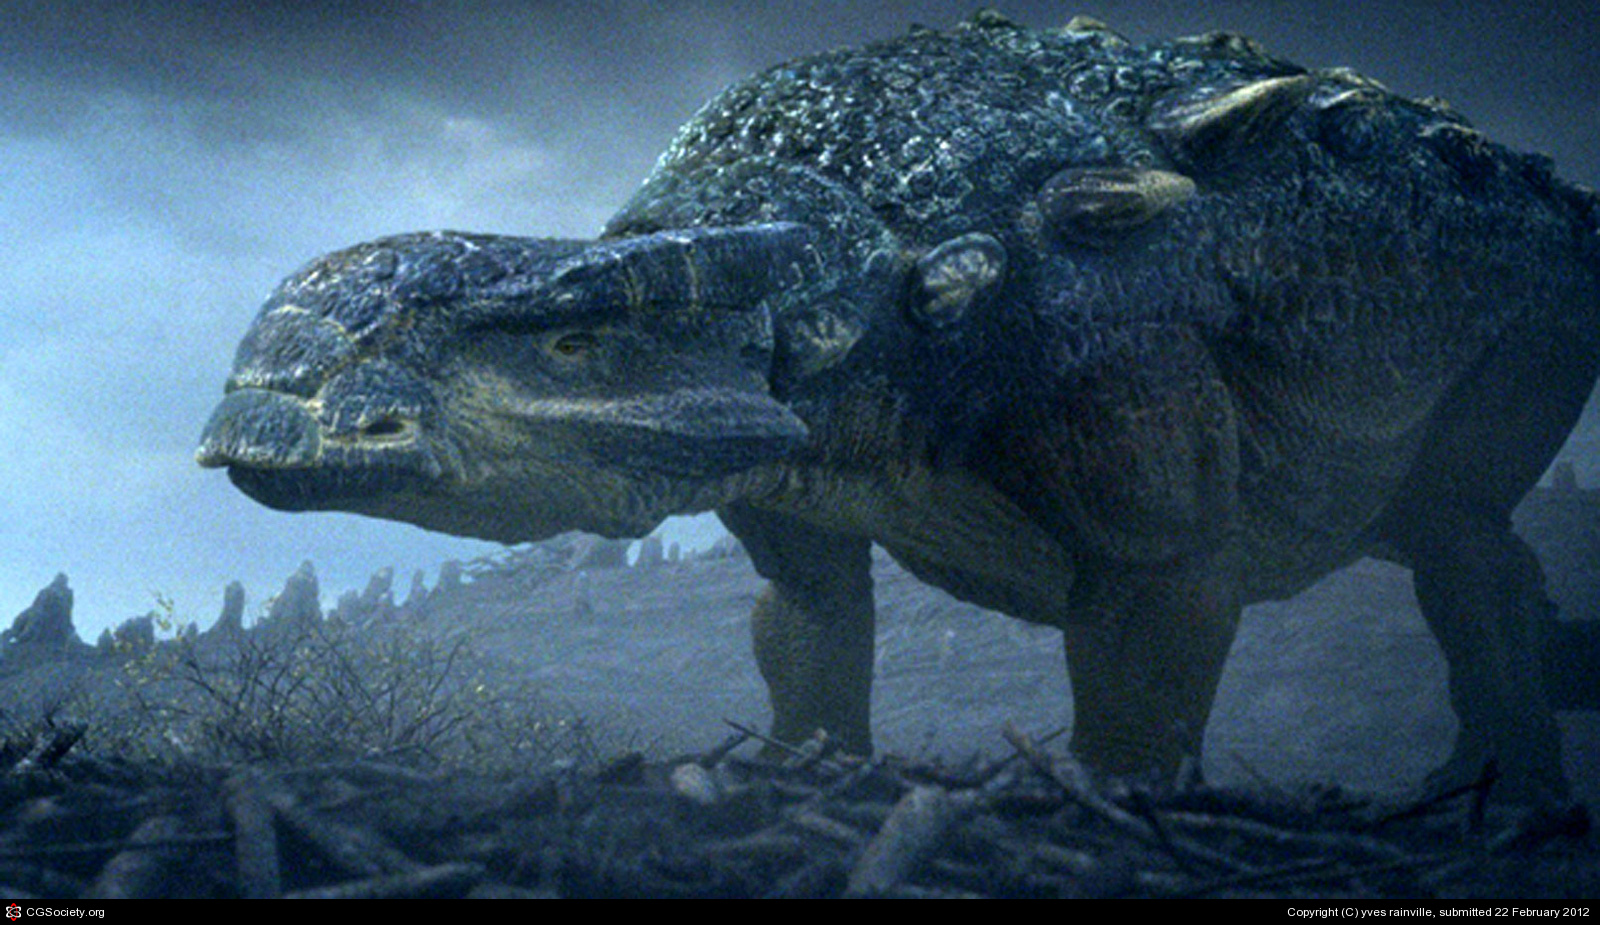 Ankylosaurus - Dinopedia - the free dinosaur encyclopedia